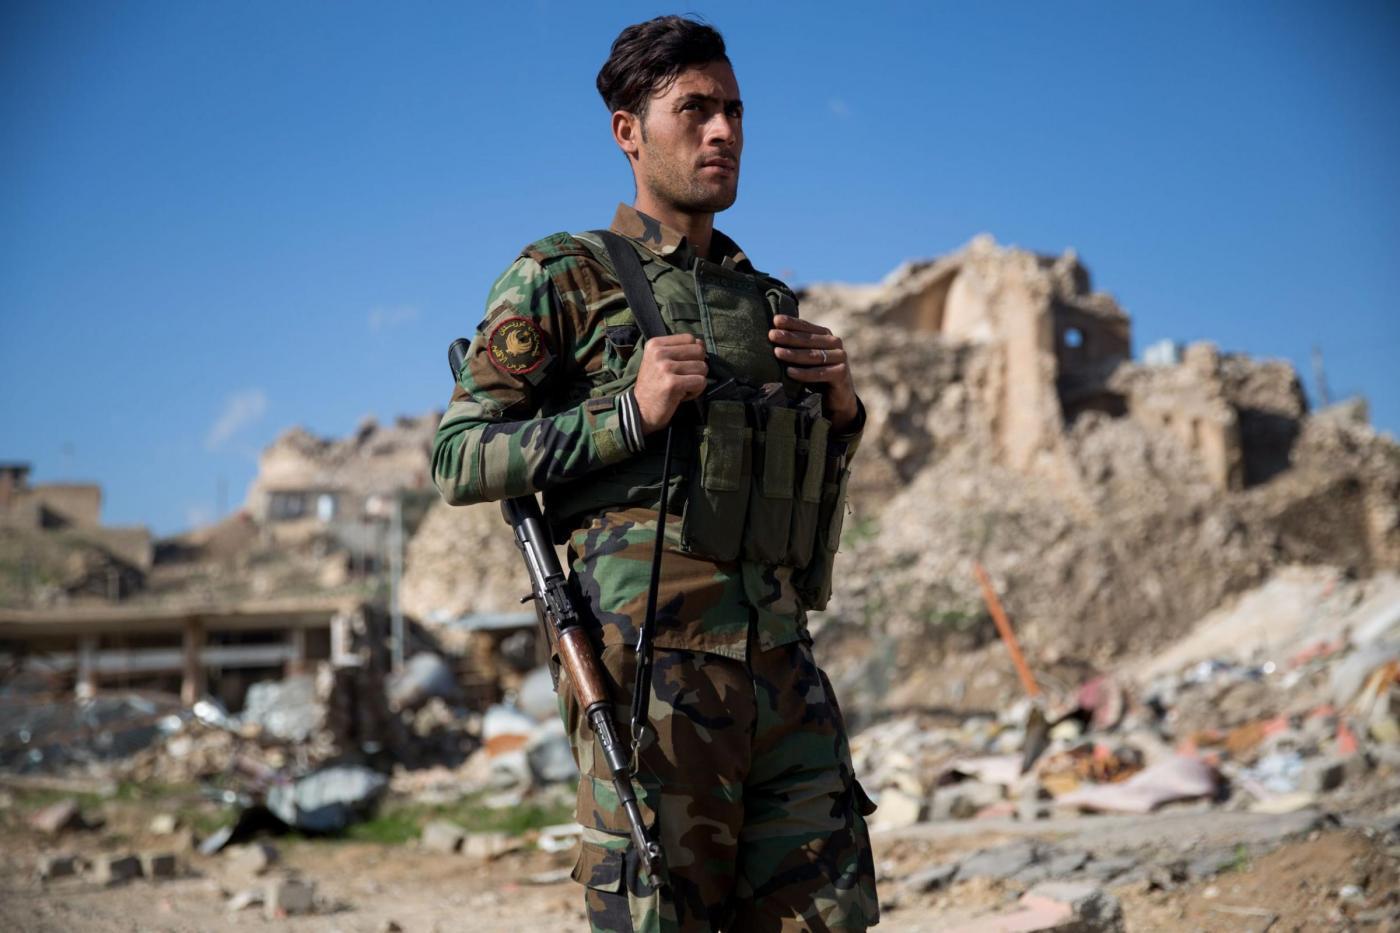 Guerra all'Isis, i curdi a Sinjar